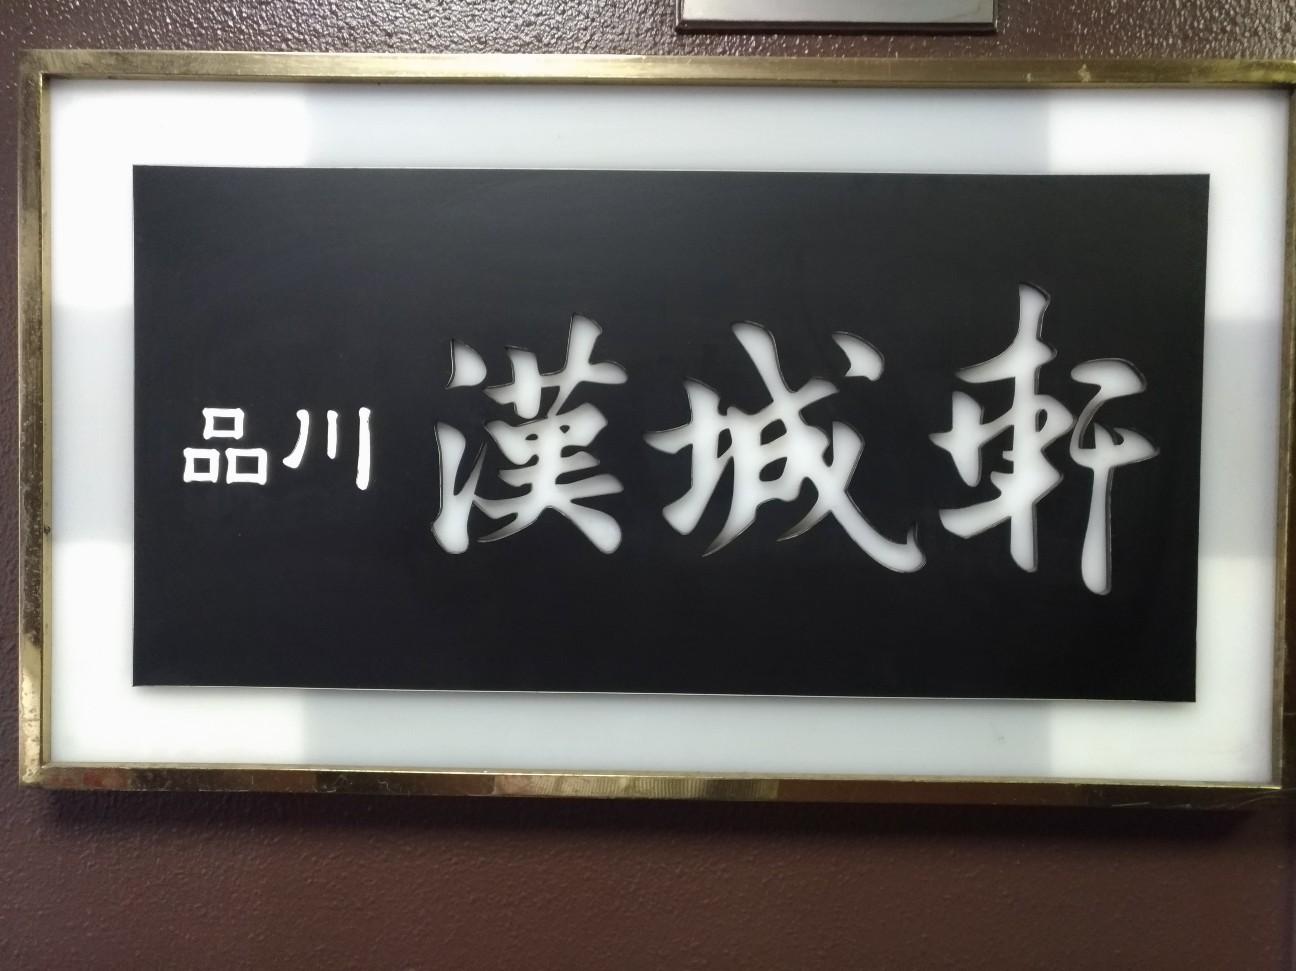 f:id:HKT1989:20200617224824j:image